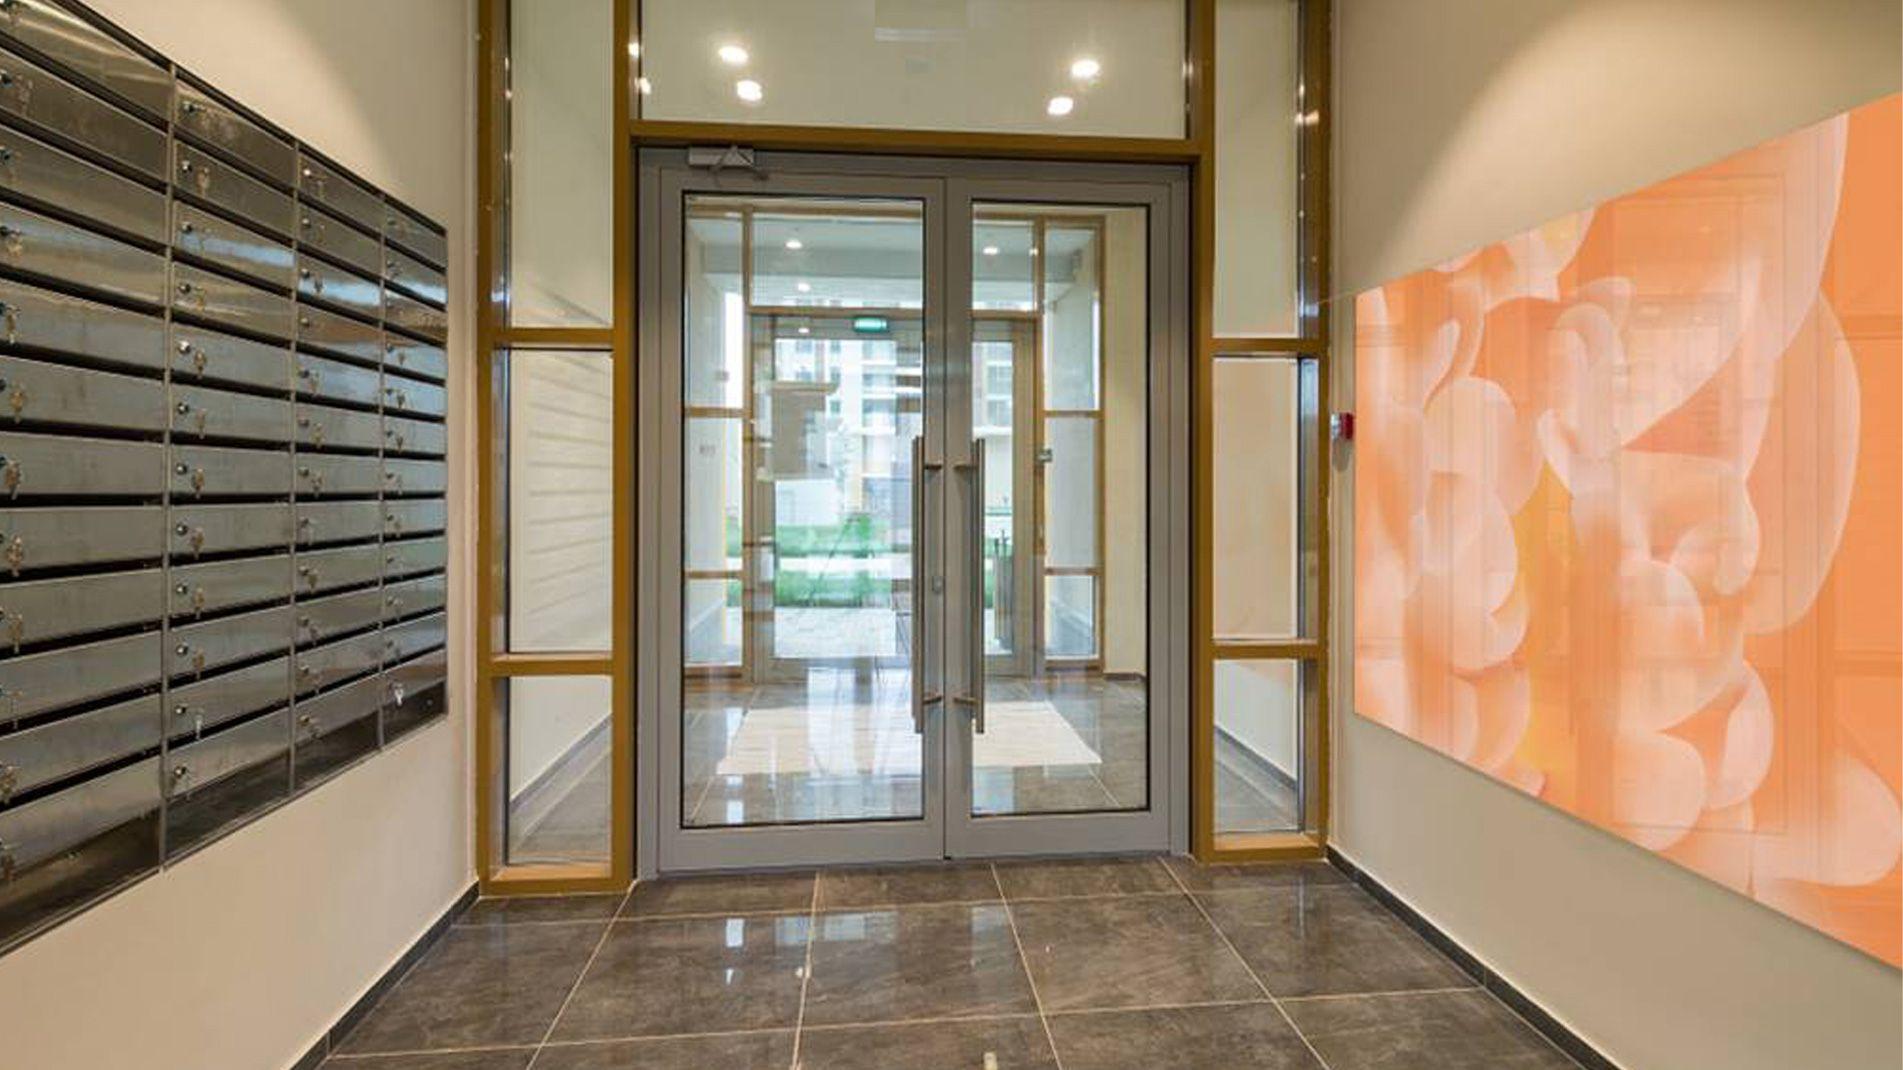 Guillaume Bottazzi, public art indoor, enamels on glass